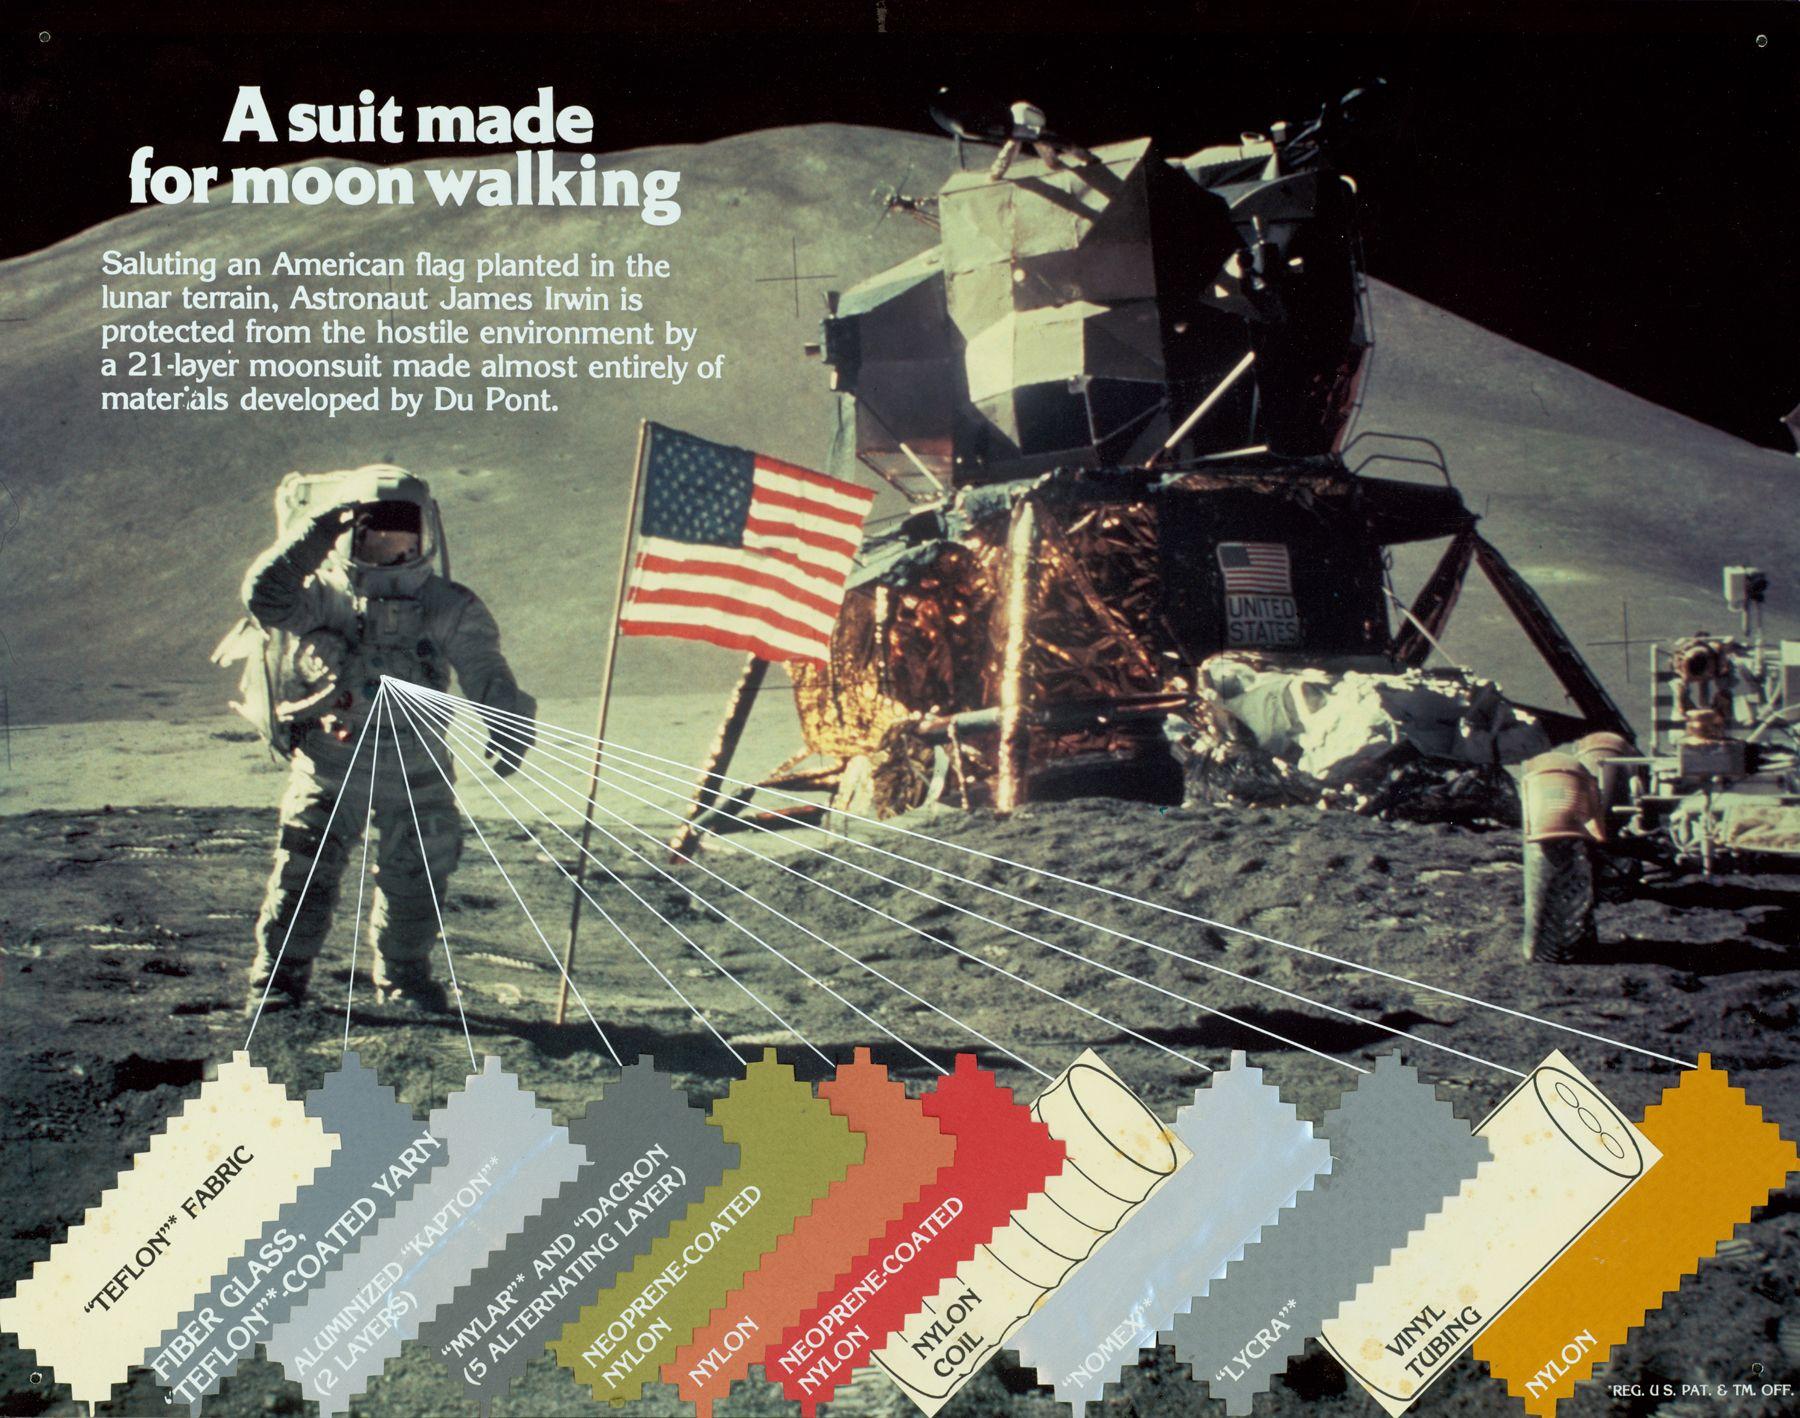 astronaut space suit material - photo #20